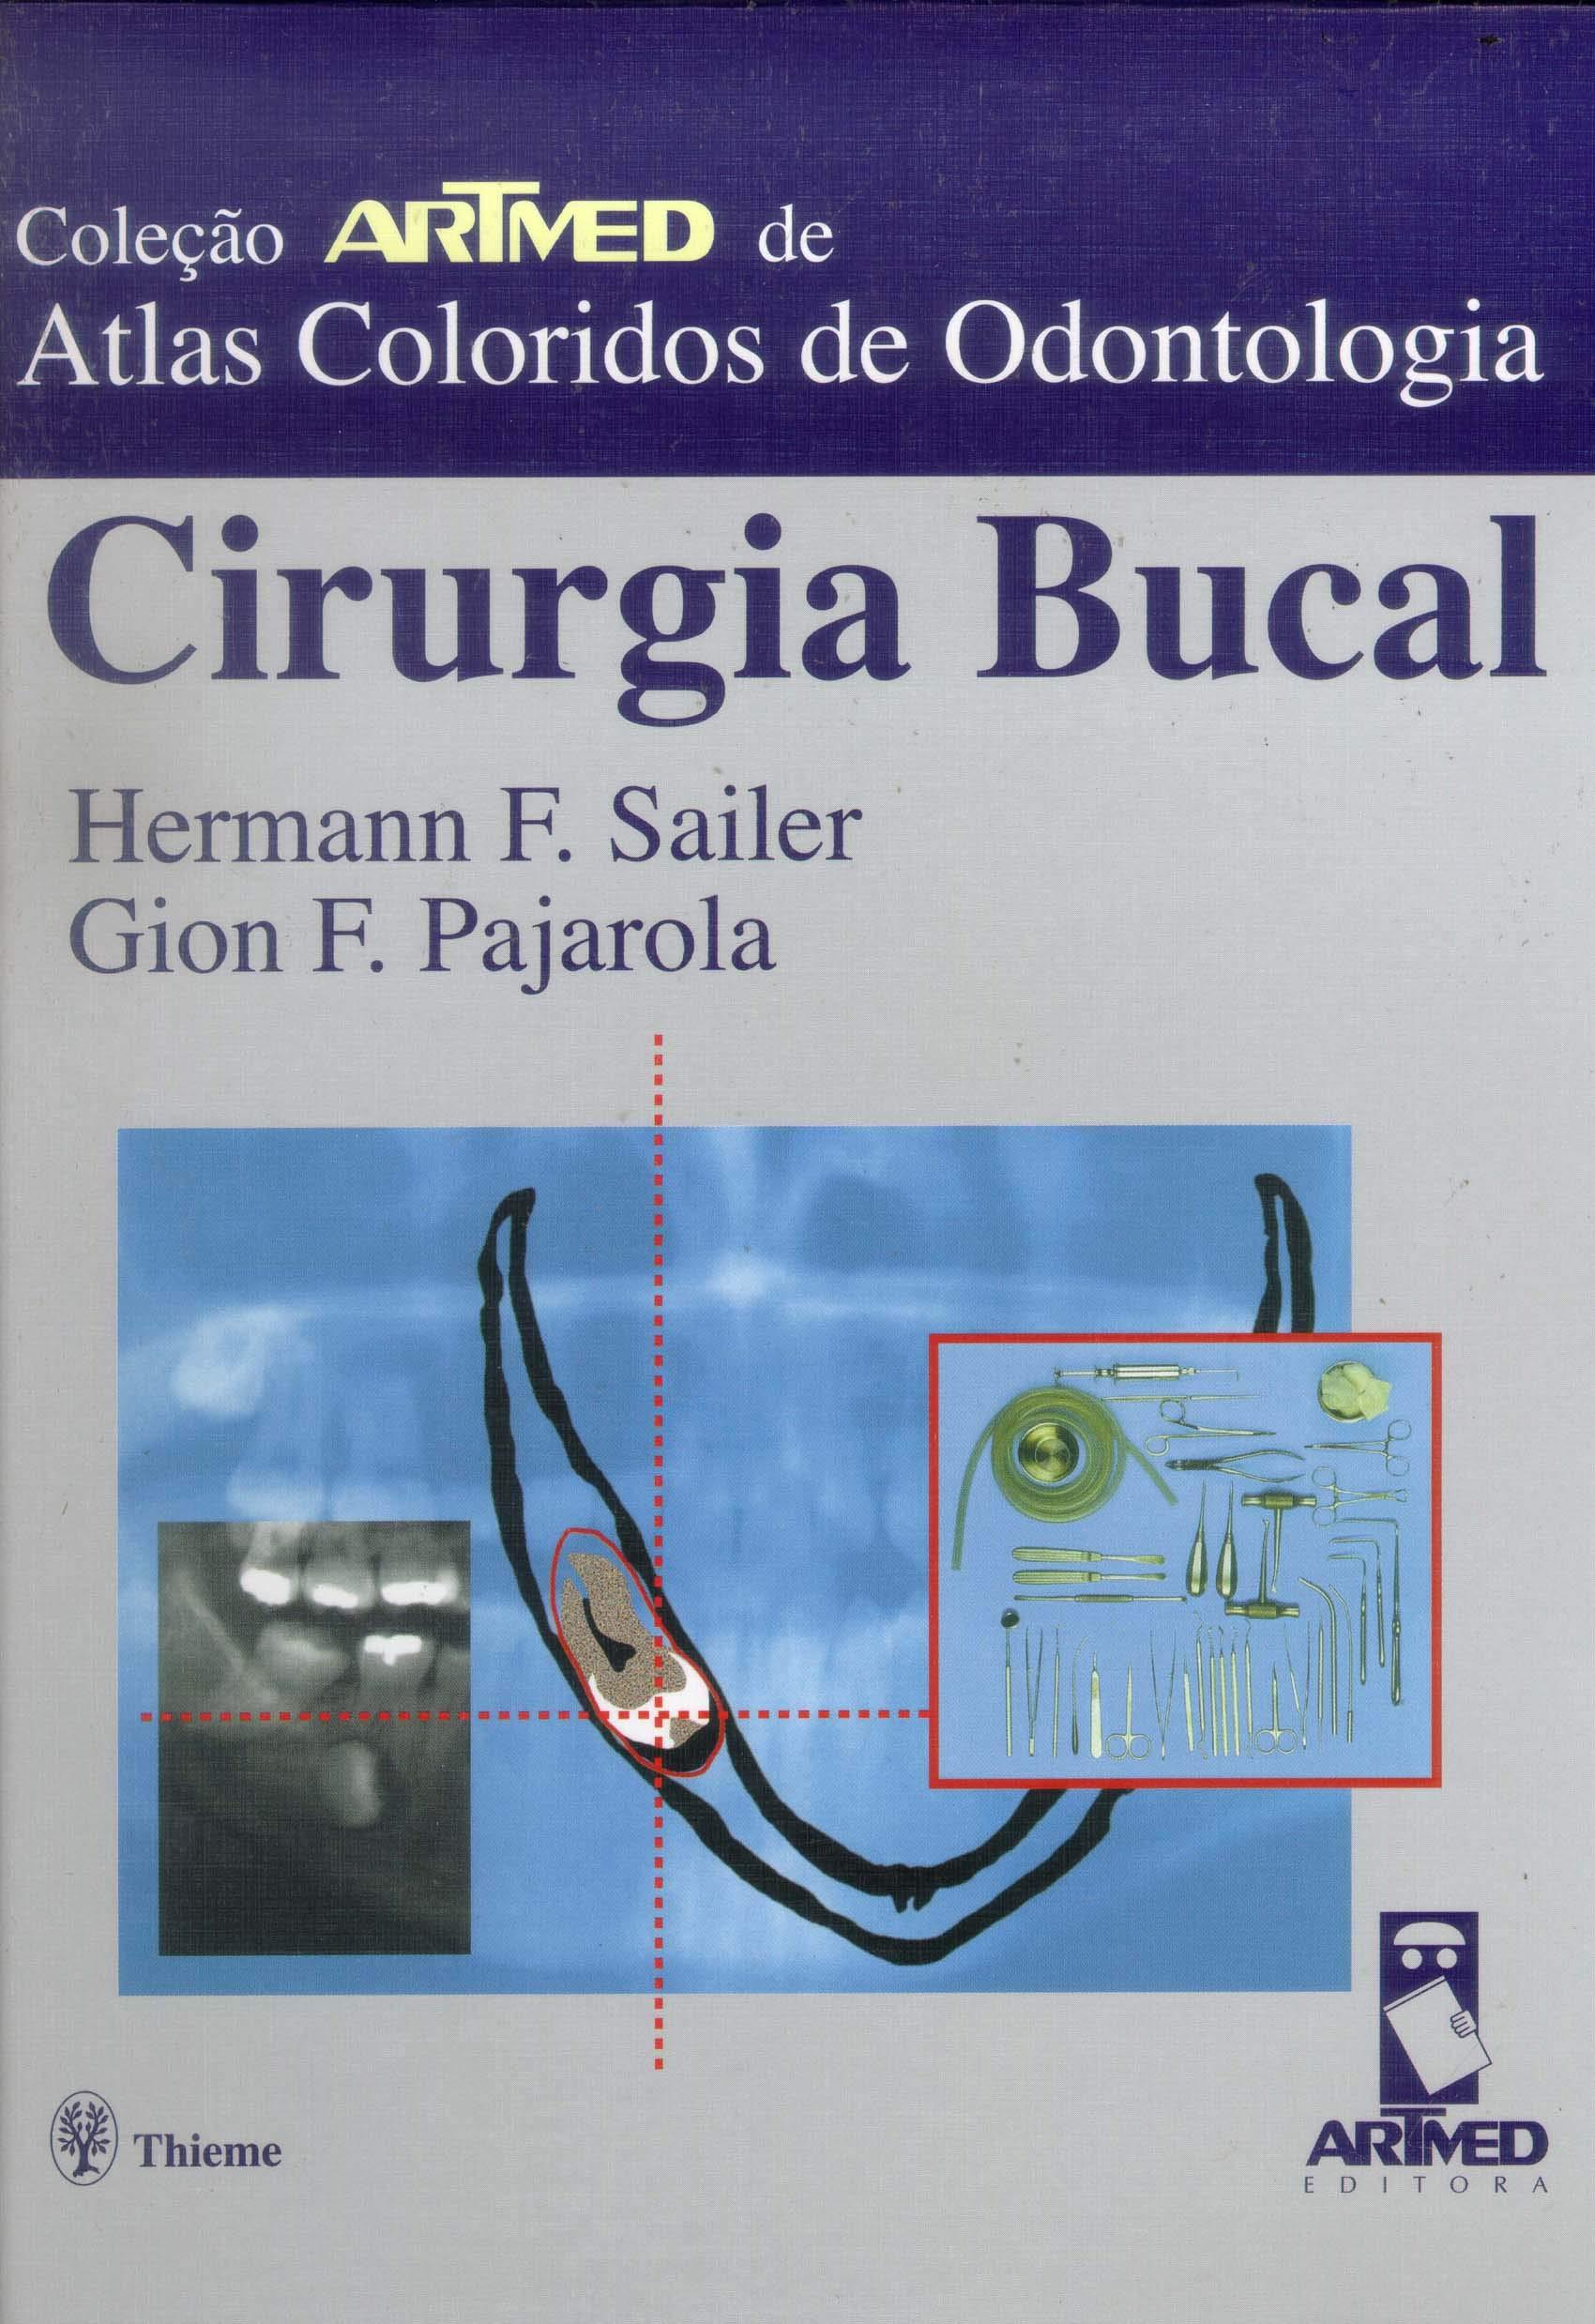 Cirurgia Bucal. Atlas Colorido de Odontologia (Em Portuguese do Brasil) (Portuguese Brazilian) Hardcover – 2000